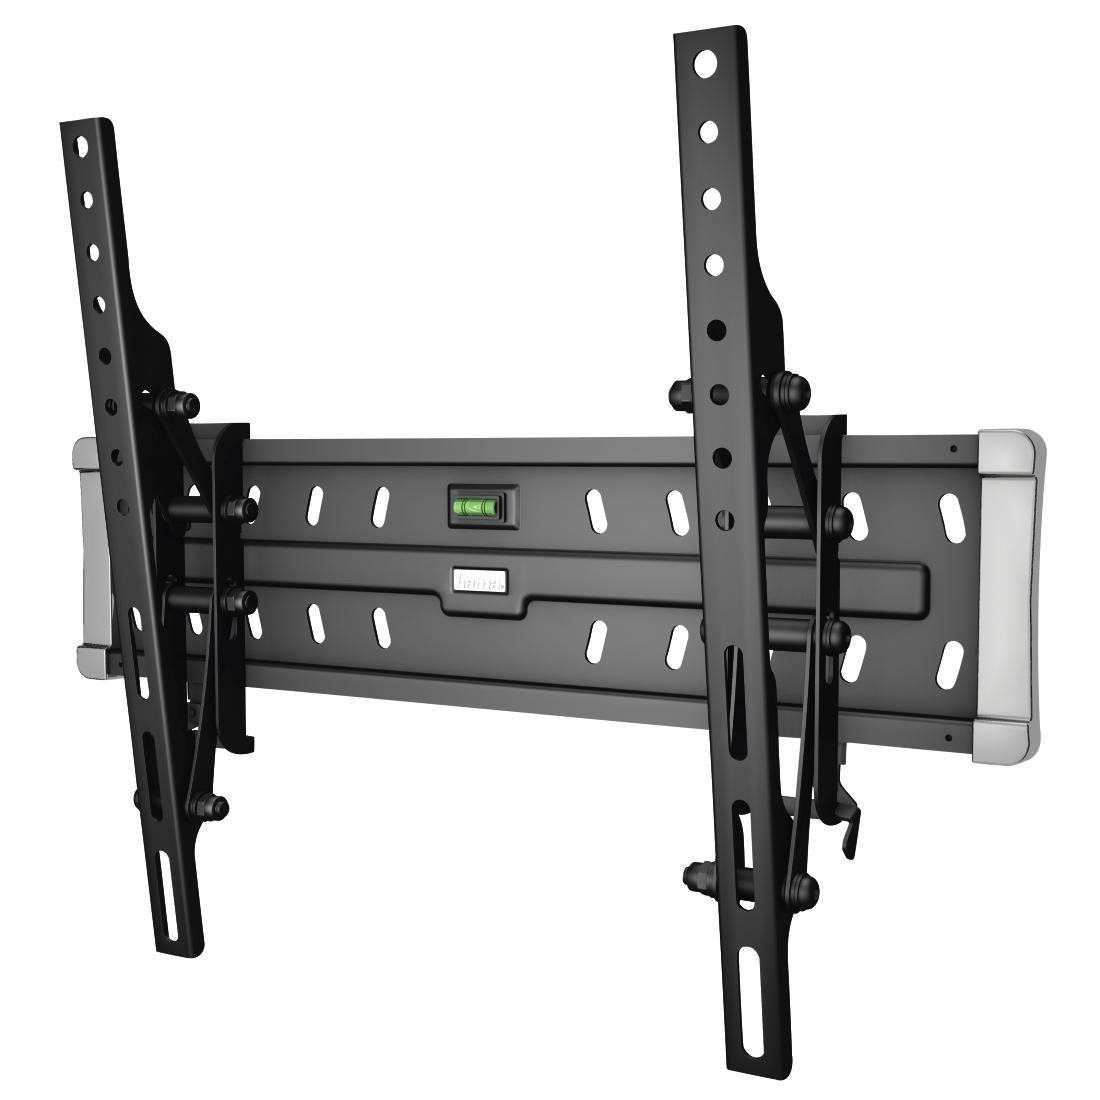 00118055 hama tv wandhalterung tilt premium vesa 400x400 165 cm 65 schwarz hama de. Black Bedroom Furniture Sets. Home Design Ideas